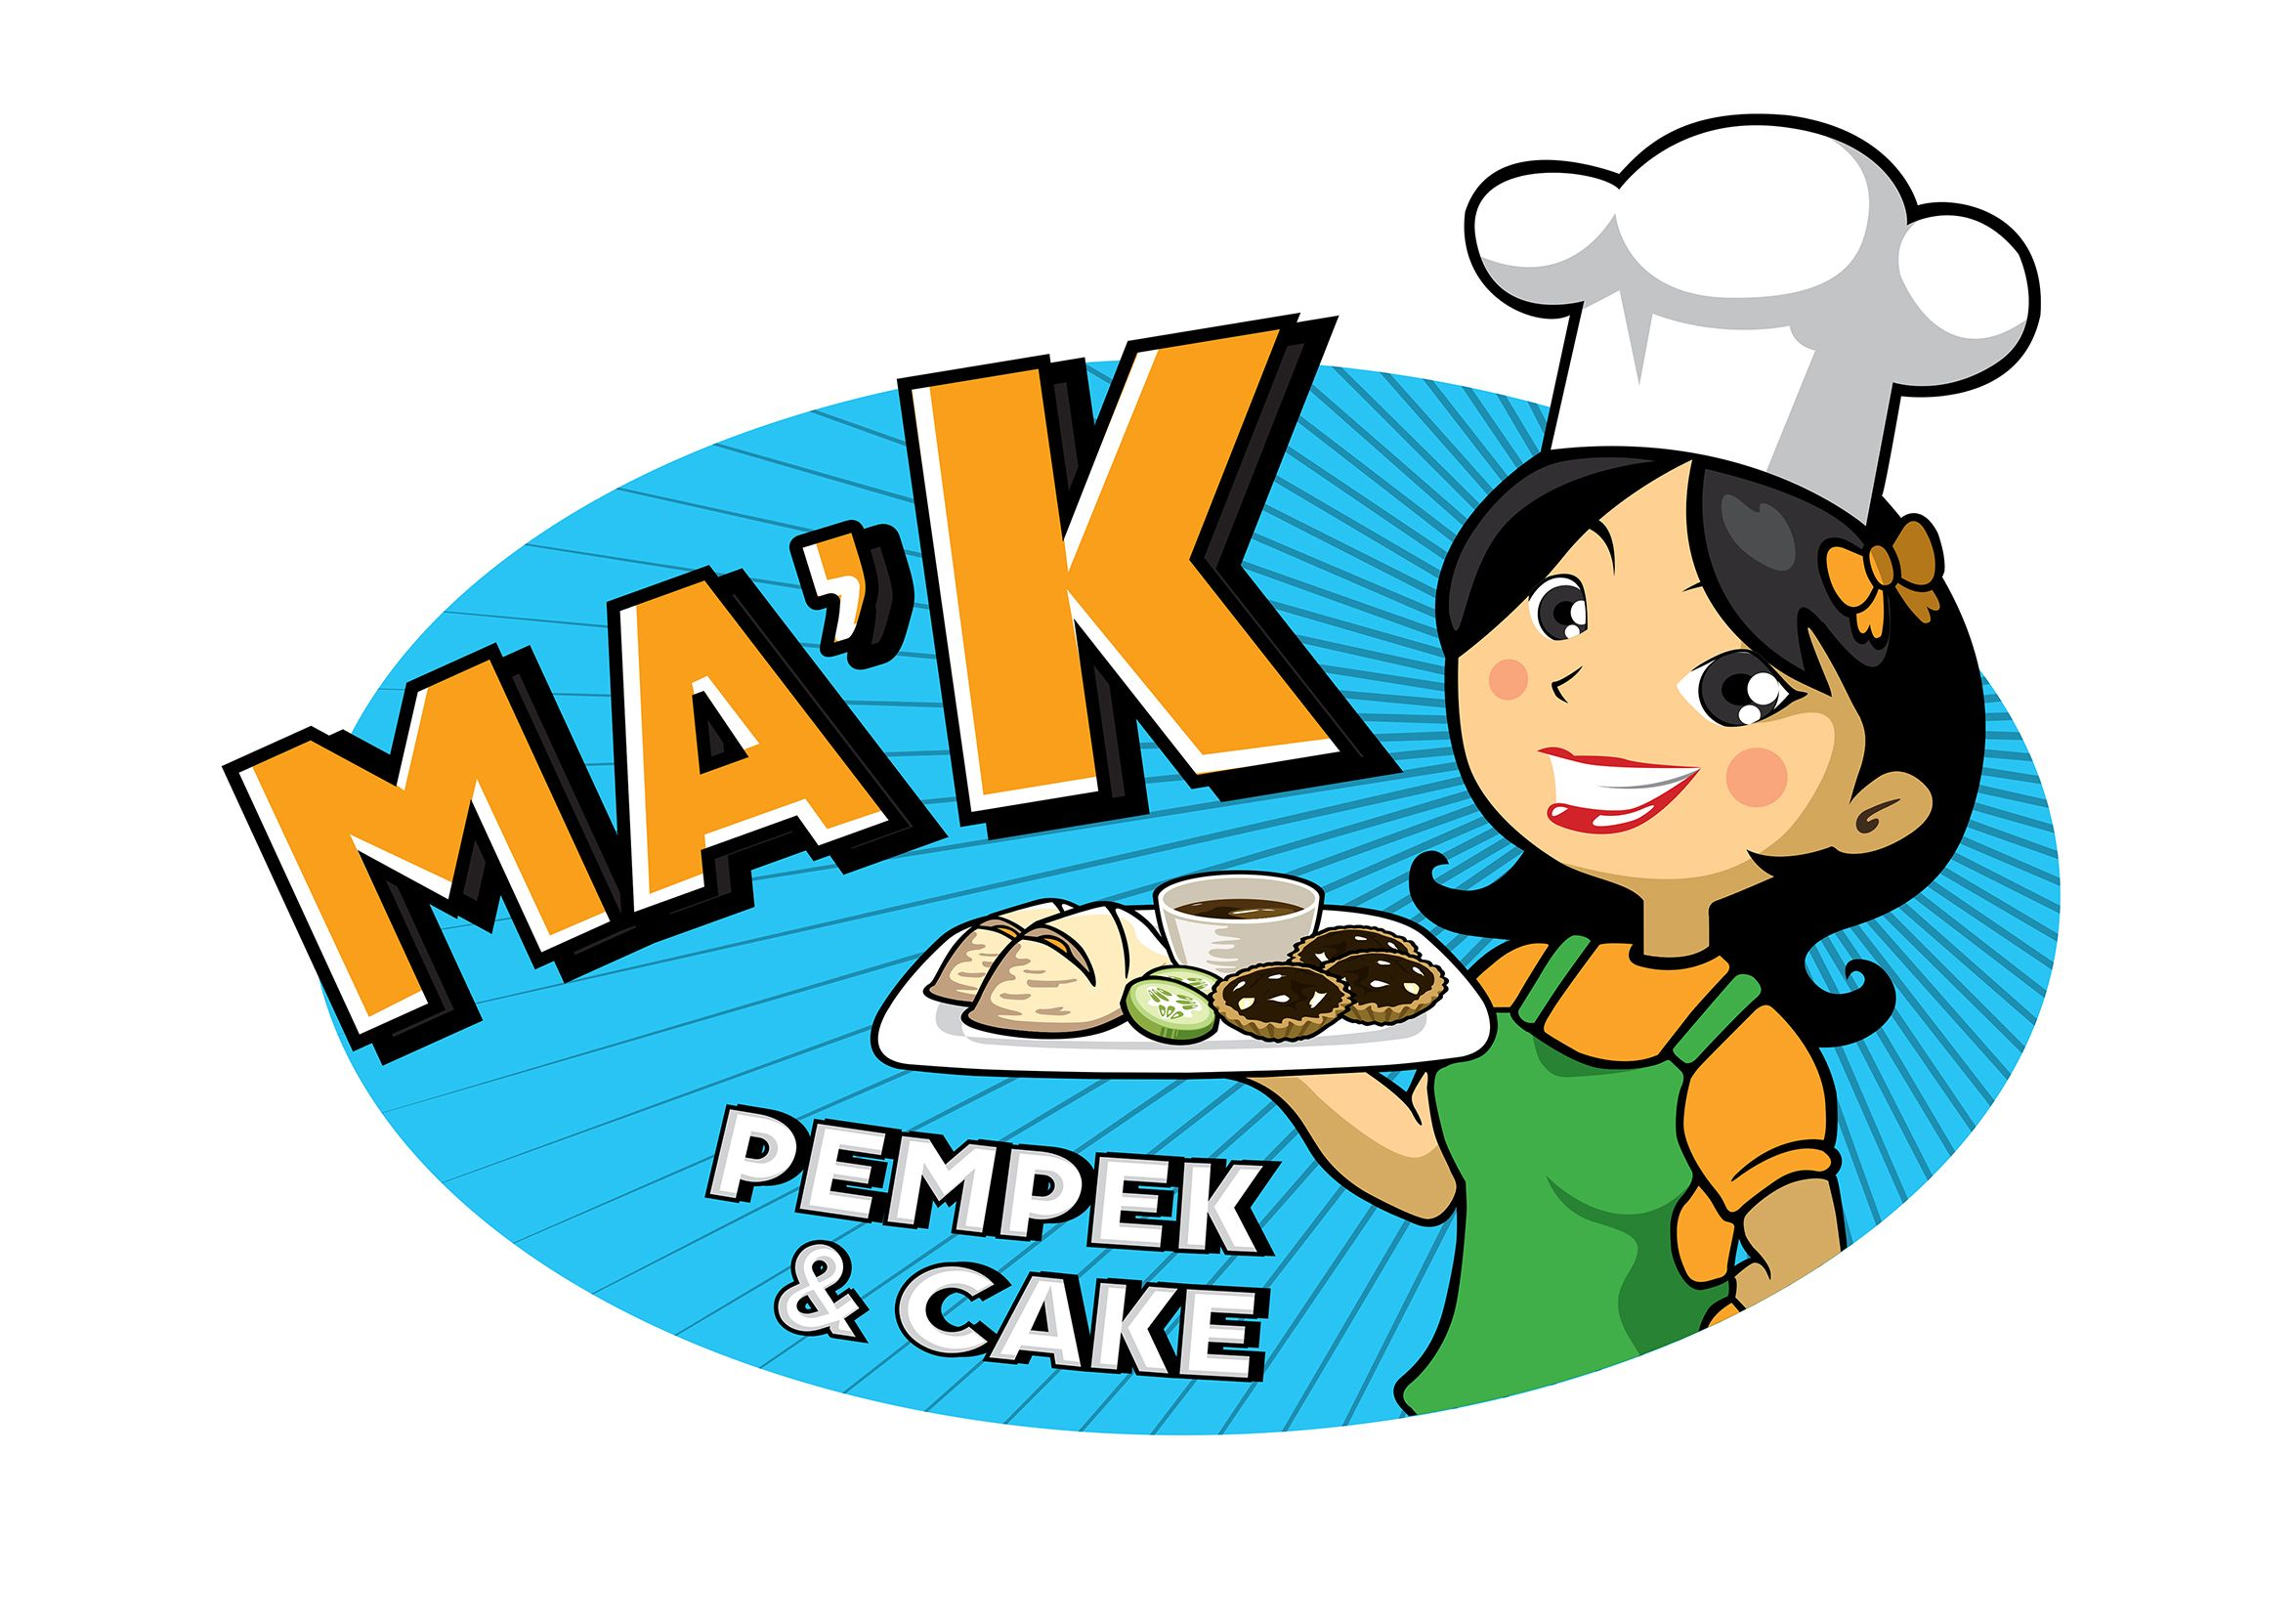 Ma K Pempek Cake Logo Desain Logo Desain Abstrak